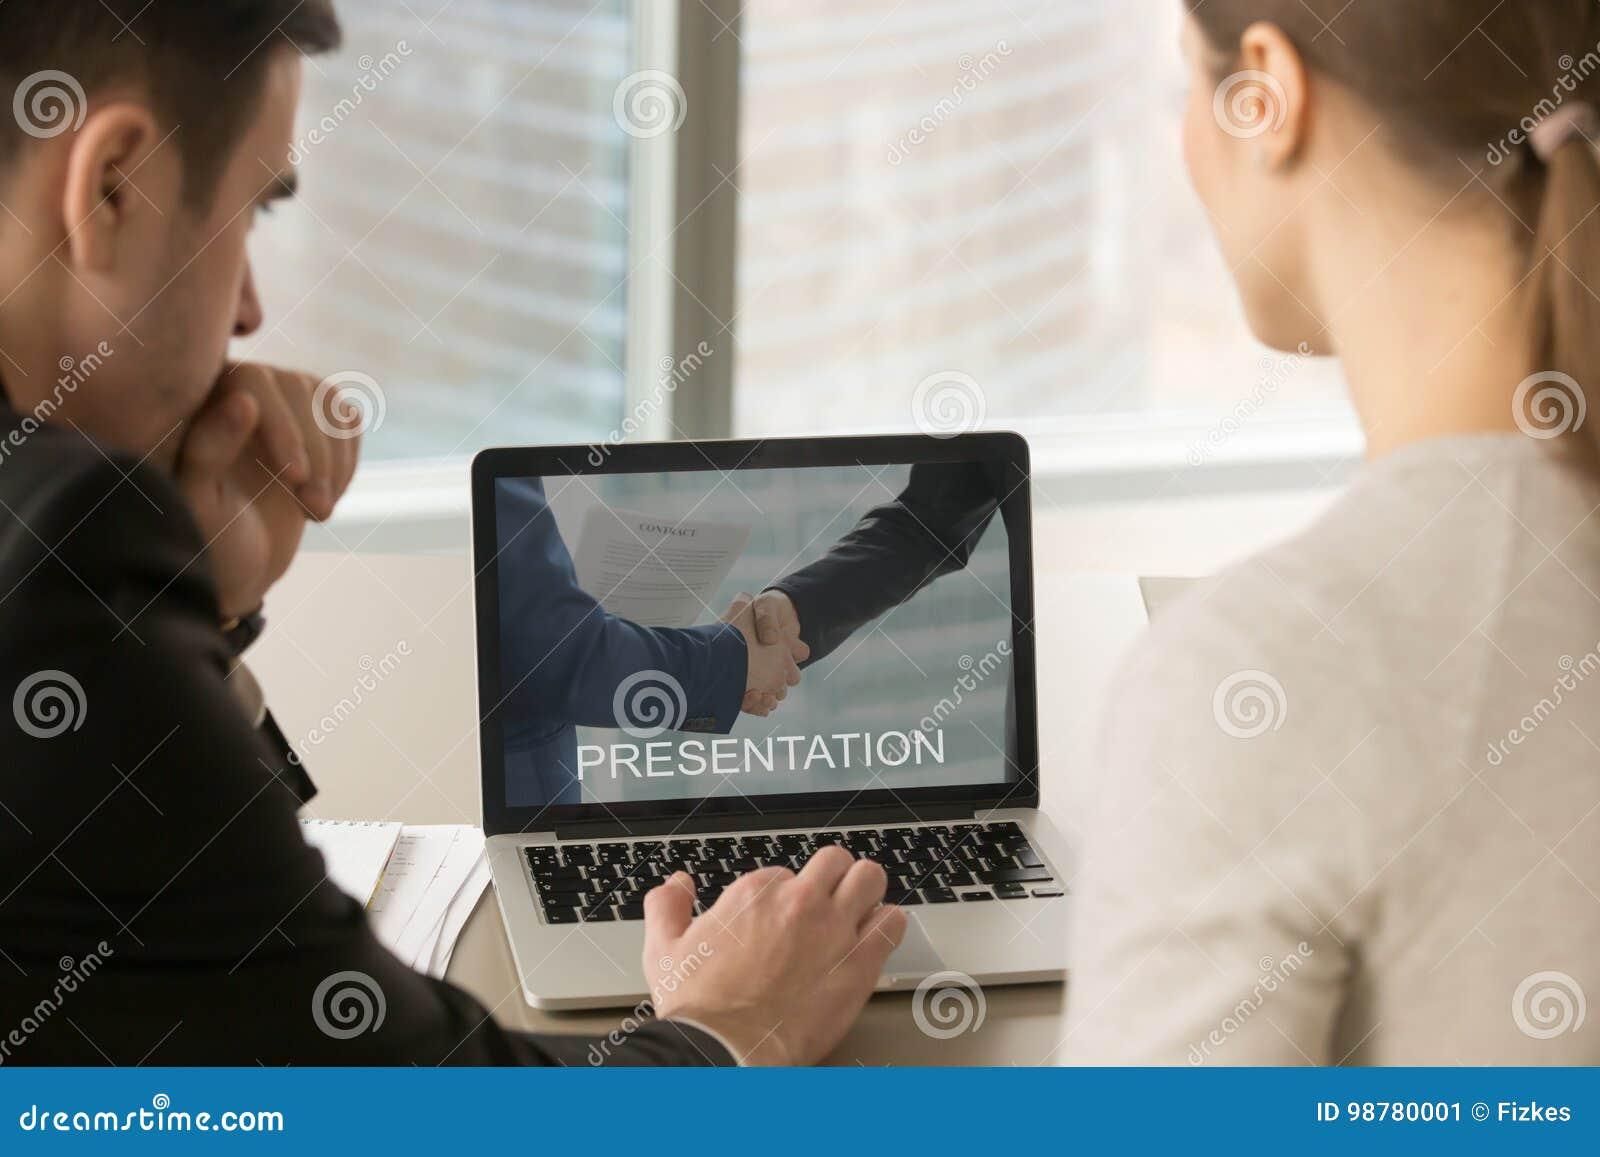 Предприниматели смотря представление на экране ПК на встрече,